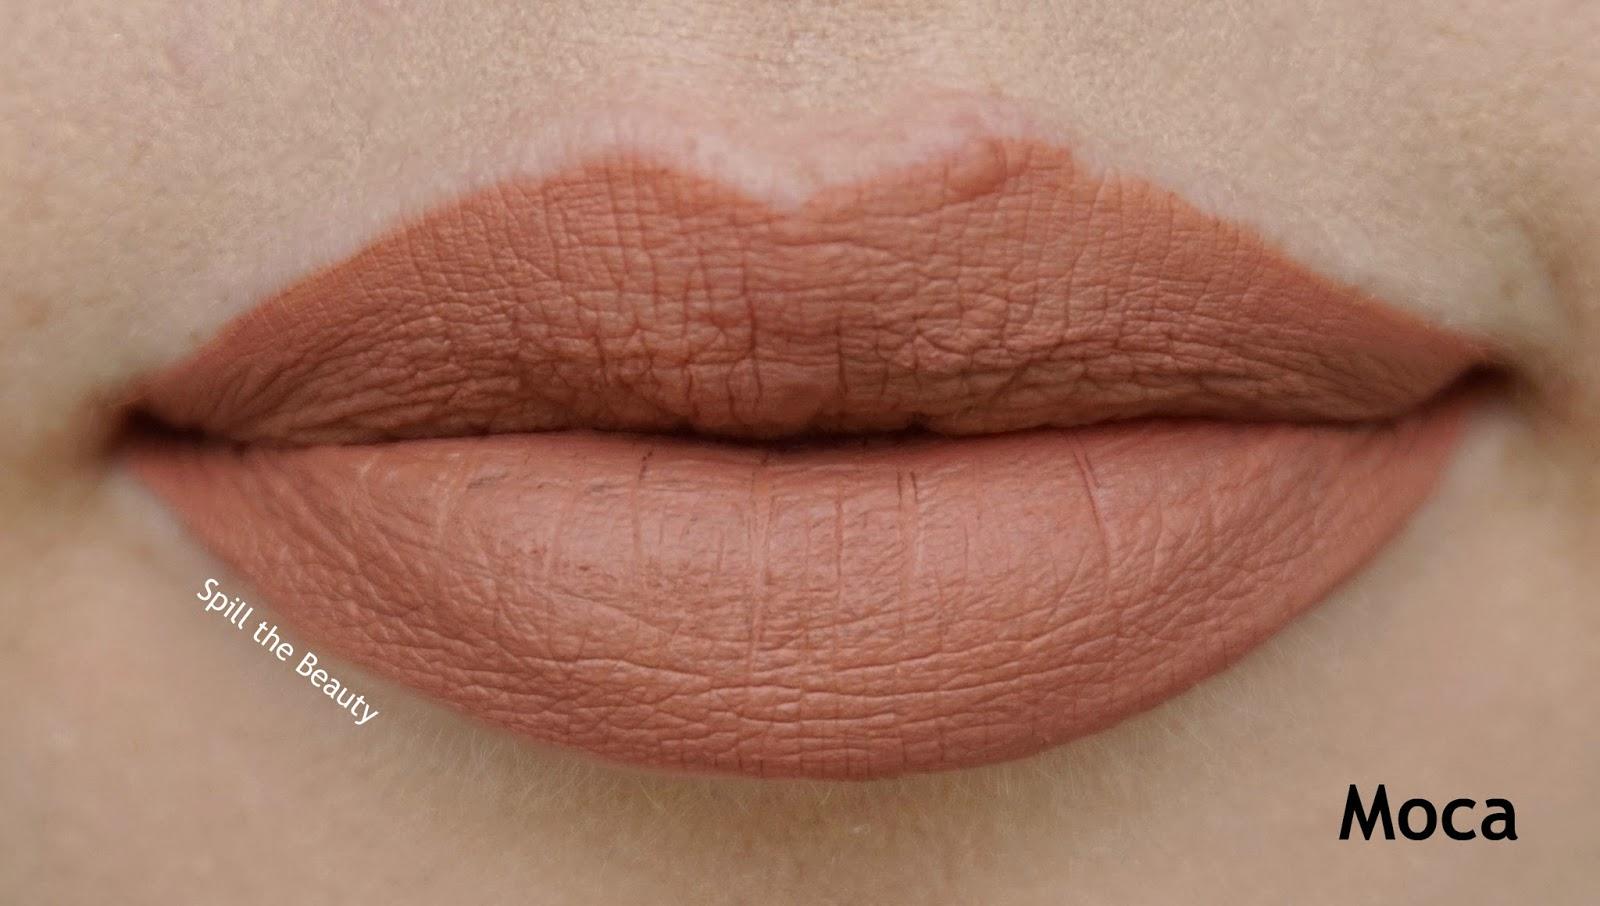 rimmel london stay matte liquid lip color review swatches 720 moca